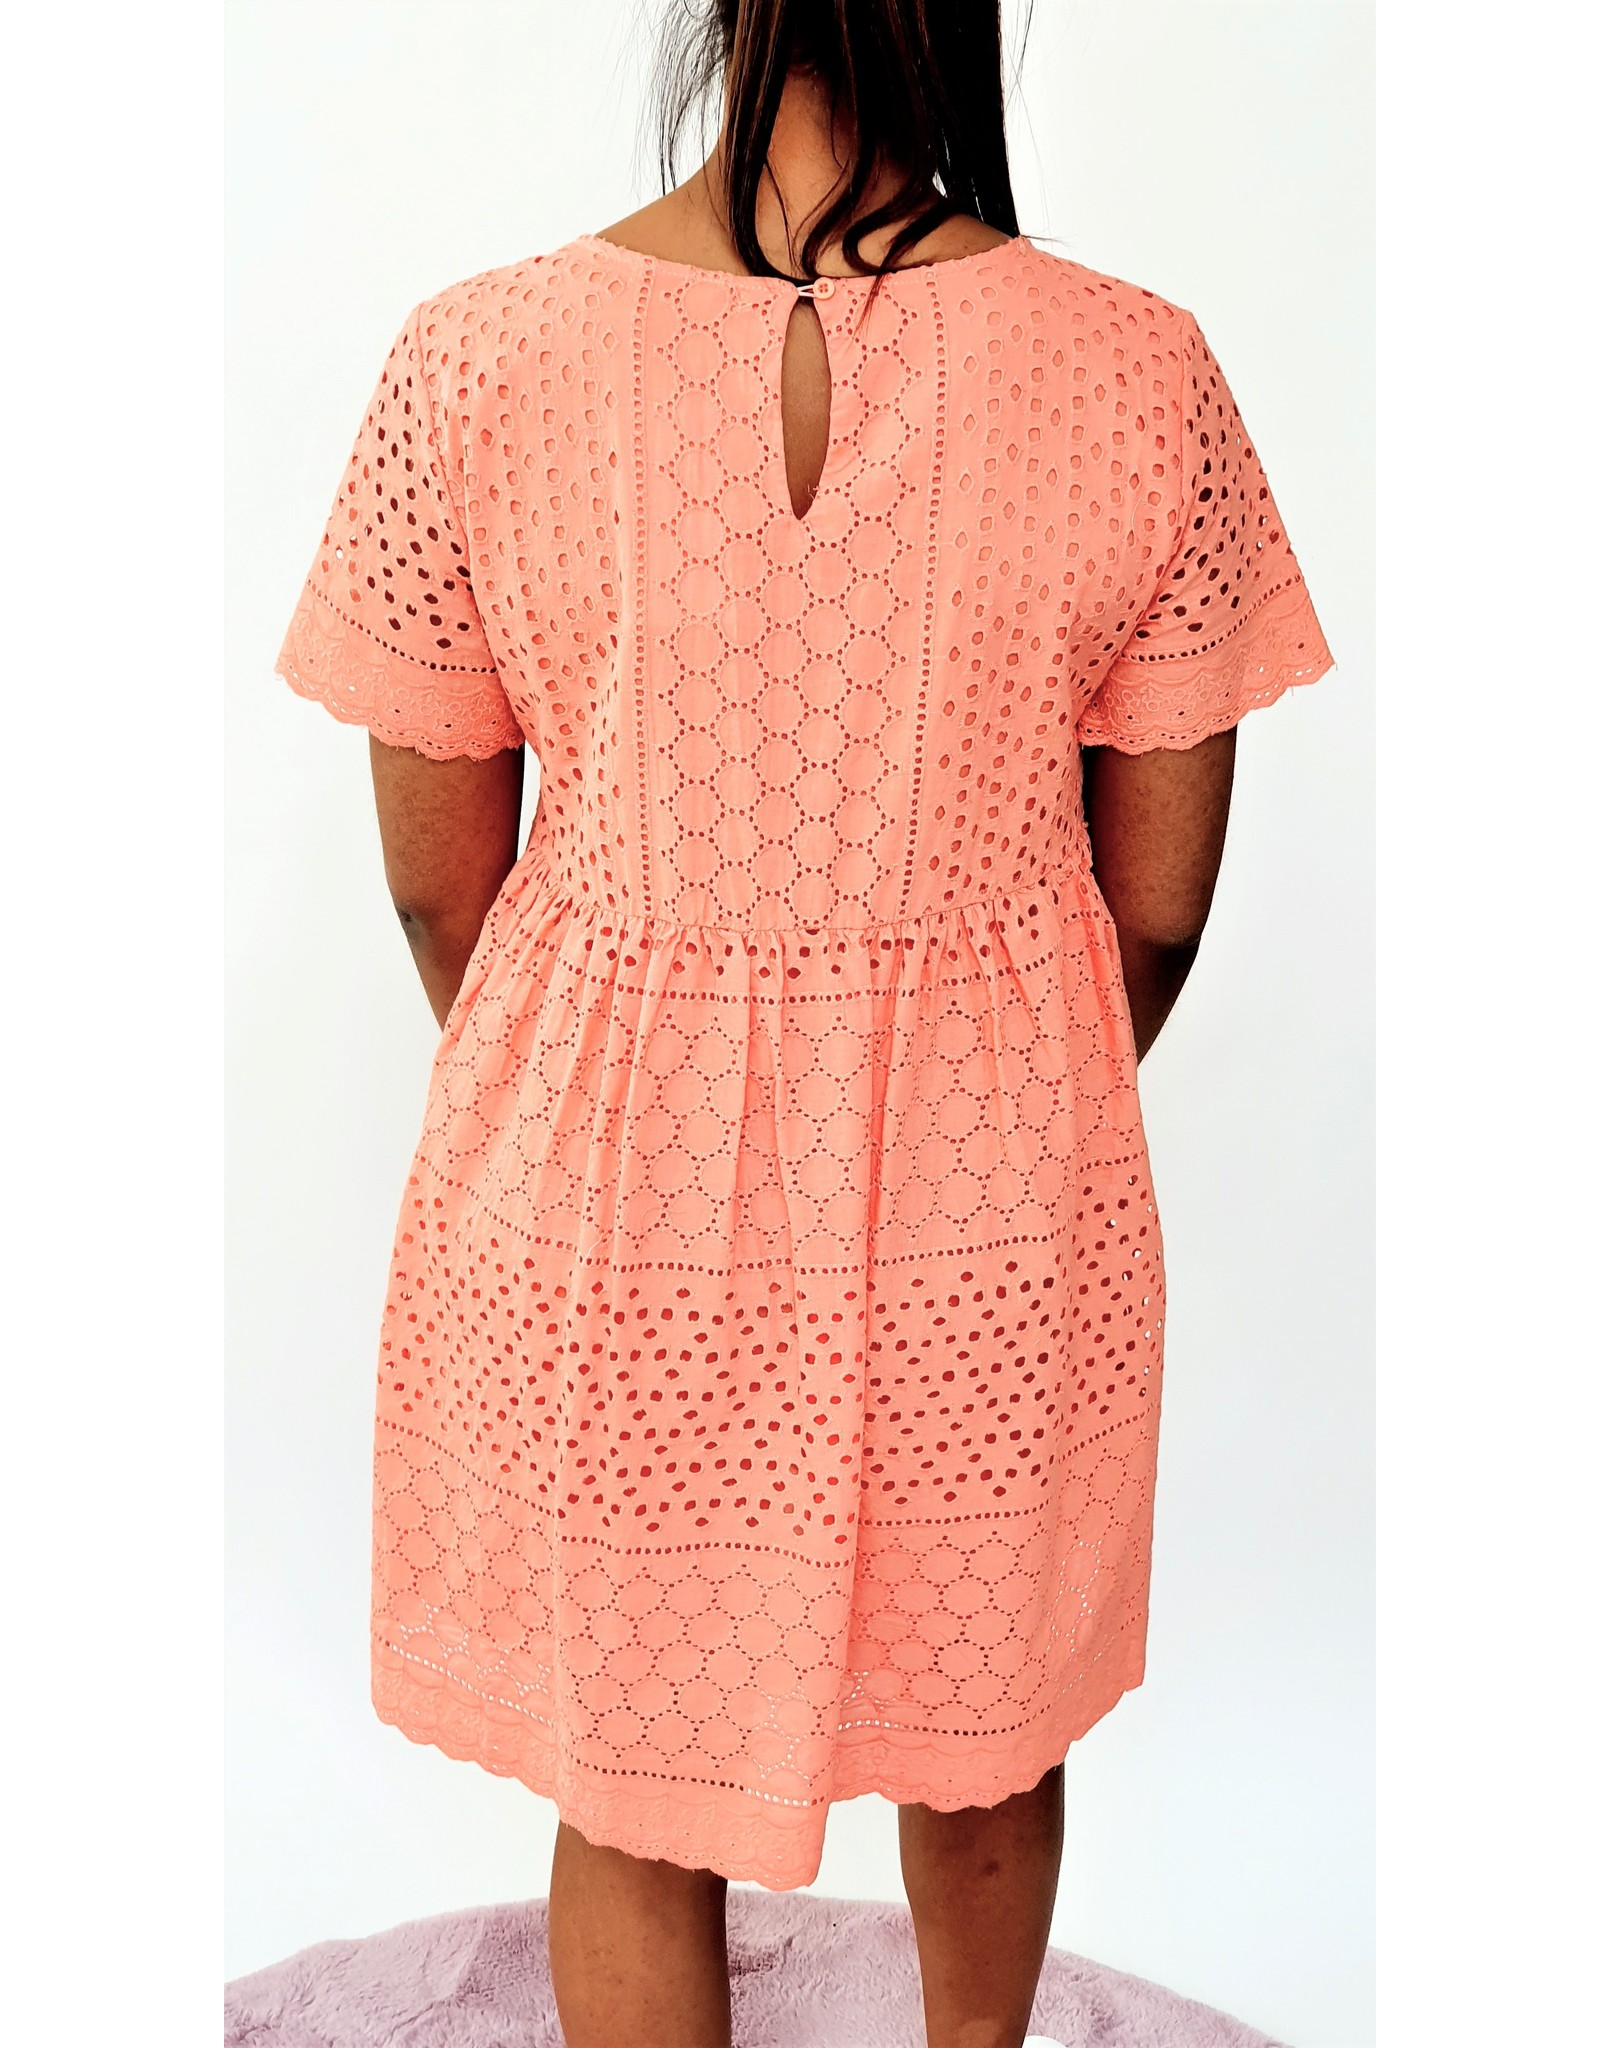 Cute Coral dress